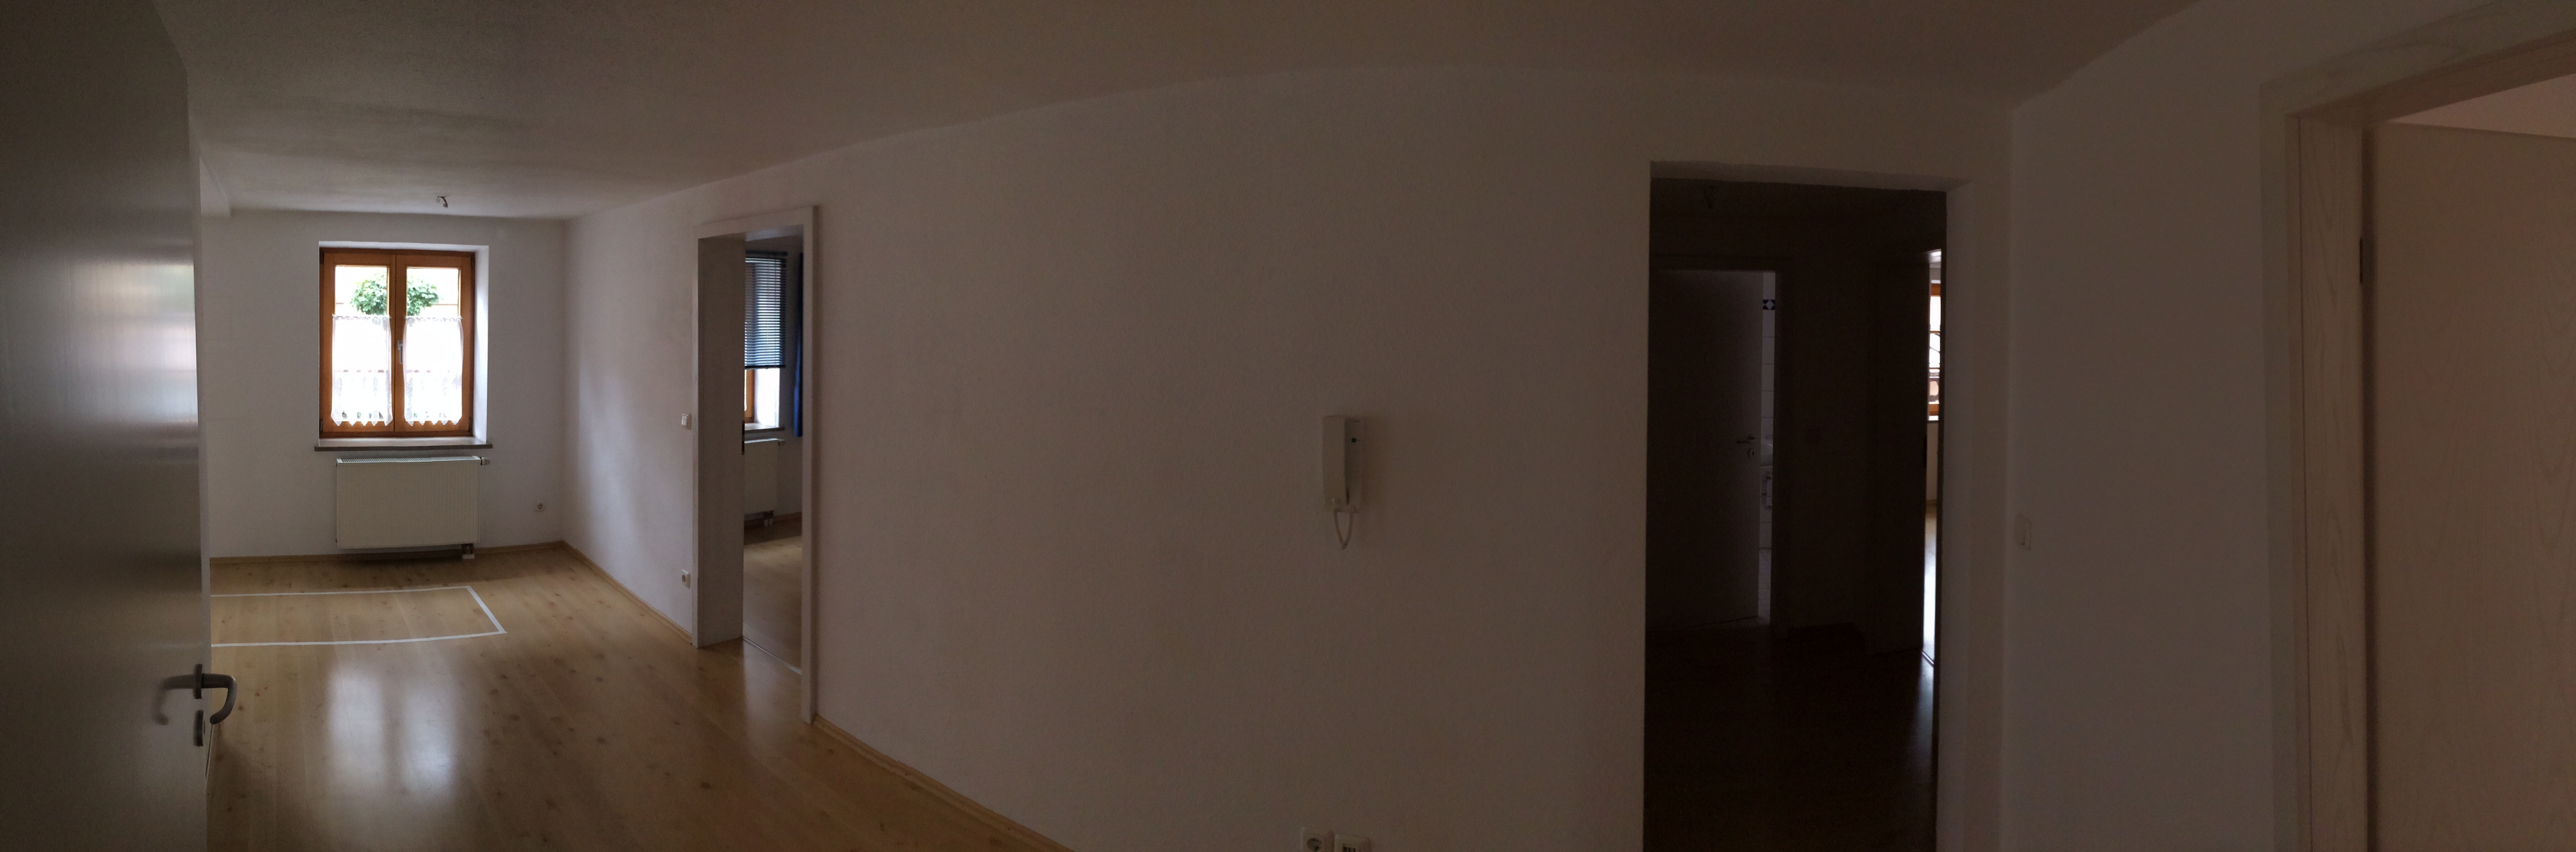 flur ganz weiss bs holzdesign. Black Bedroom Furniture Sets. Home Design Ideas